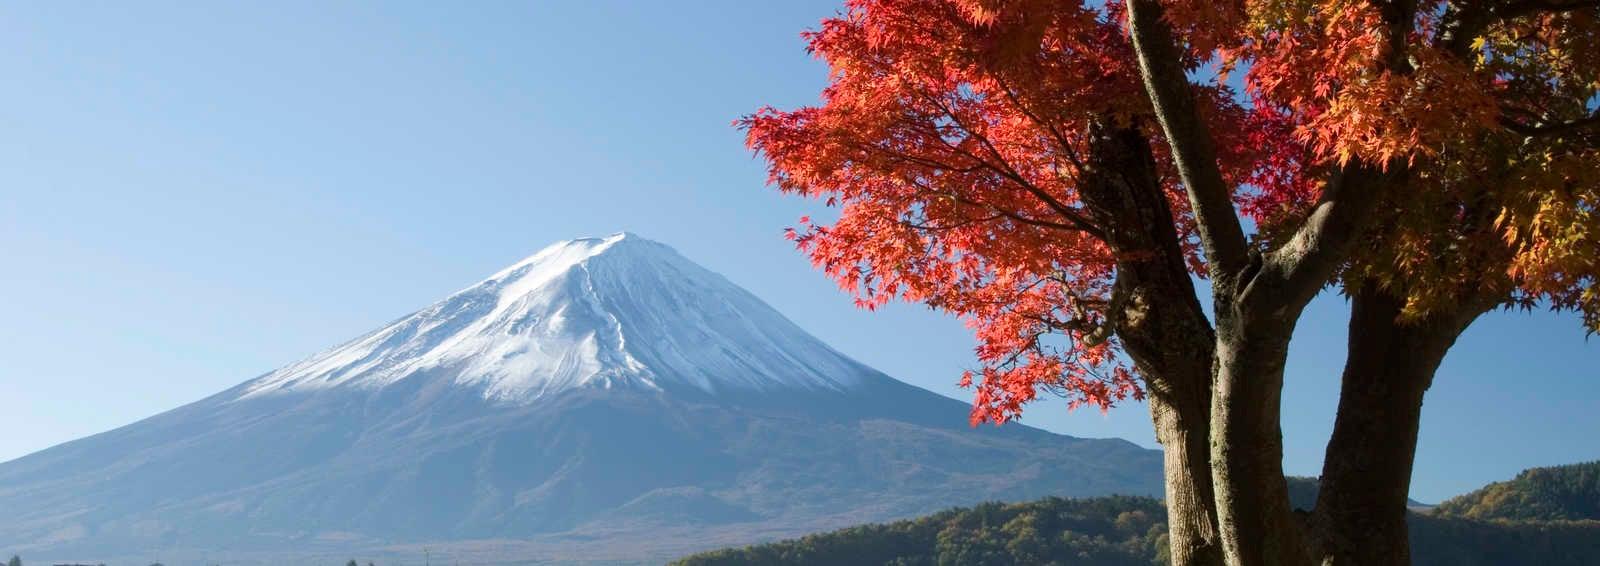 Mt Fuji in Autumn, Japan